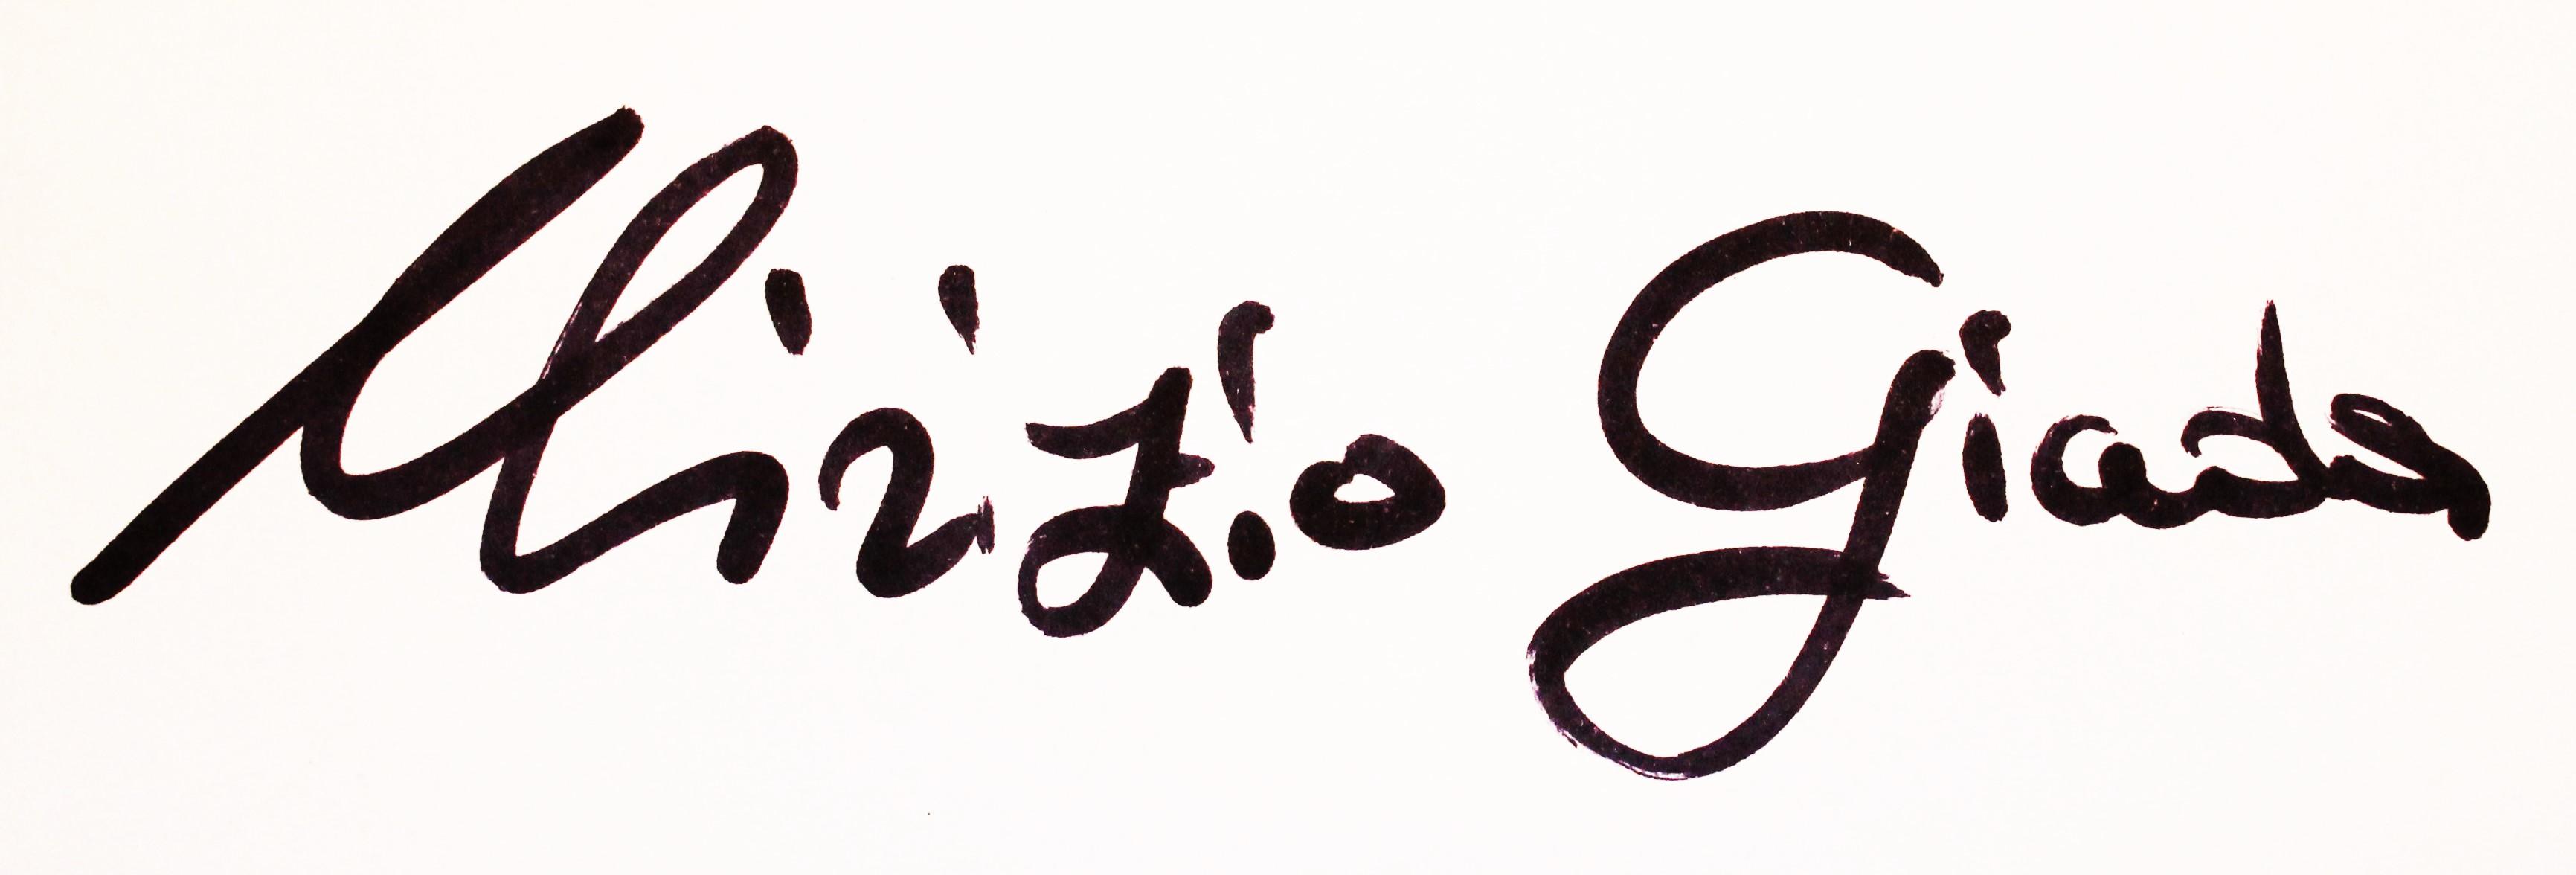 Giada Mirizio's Signature